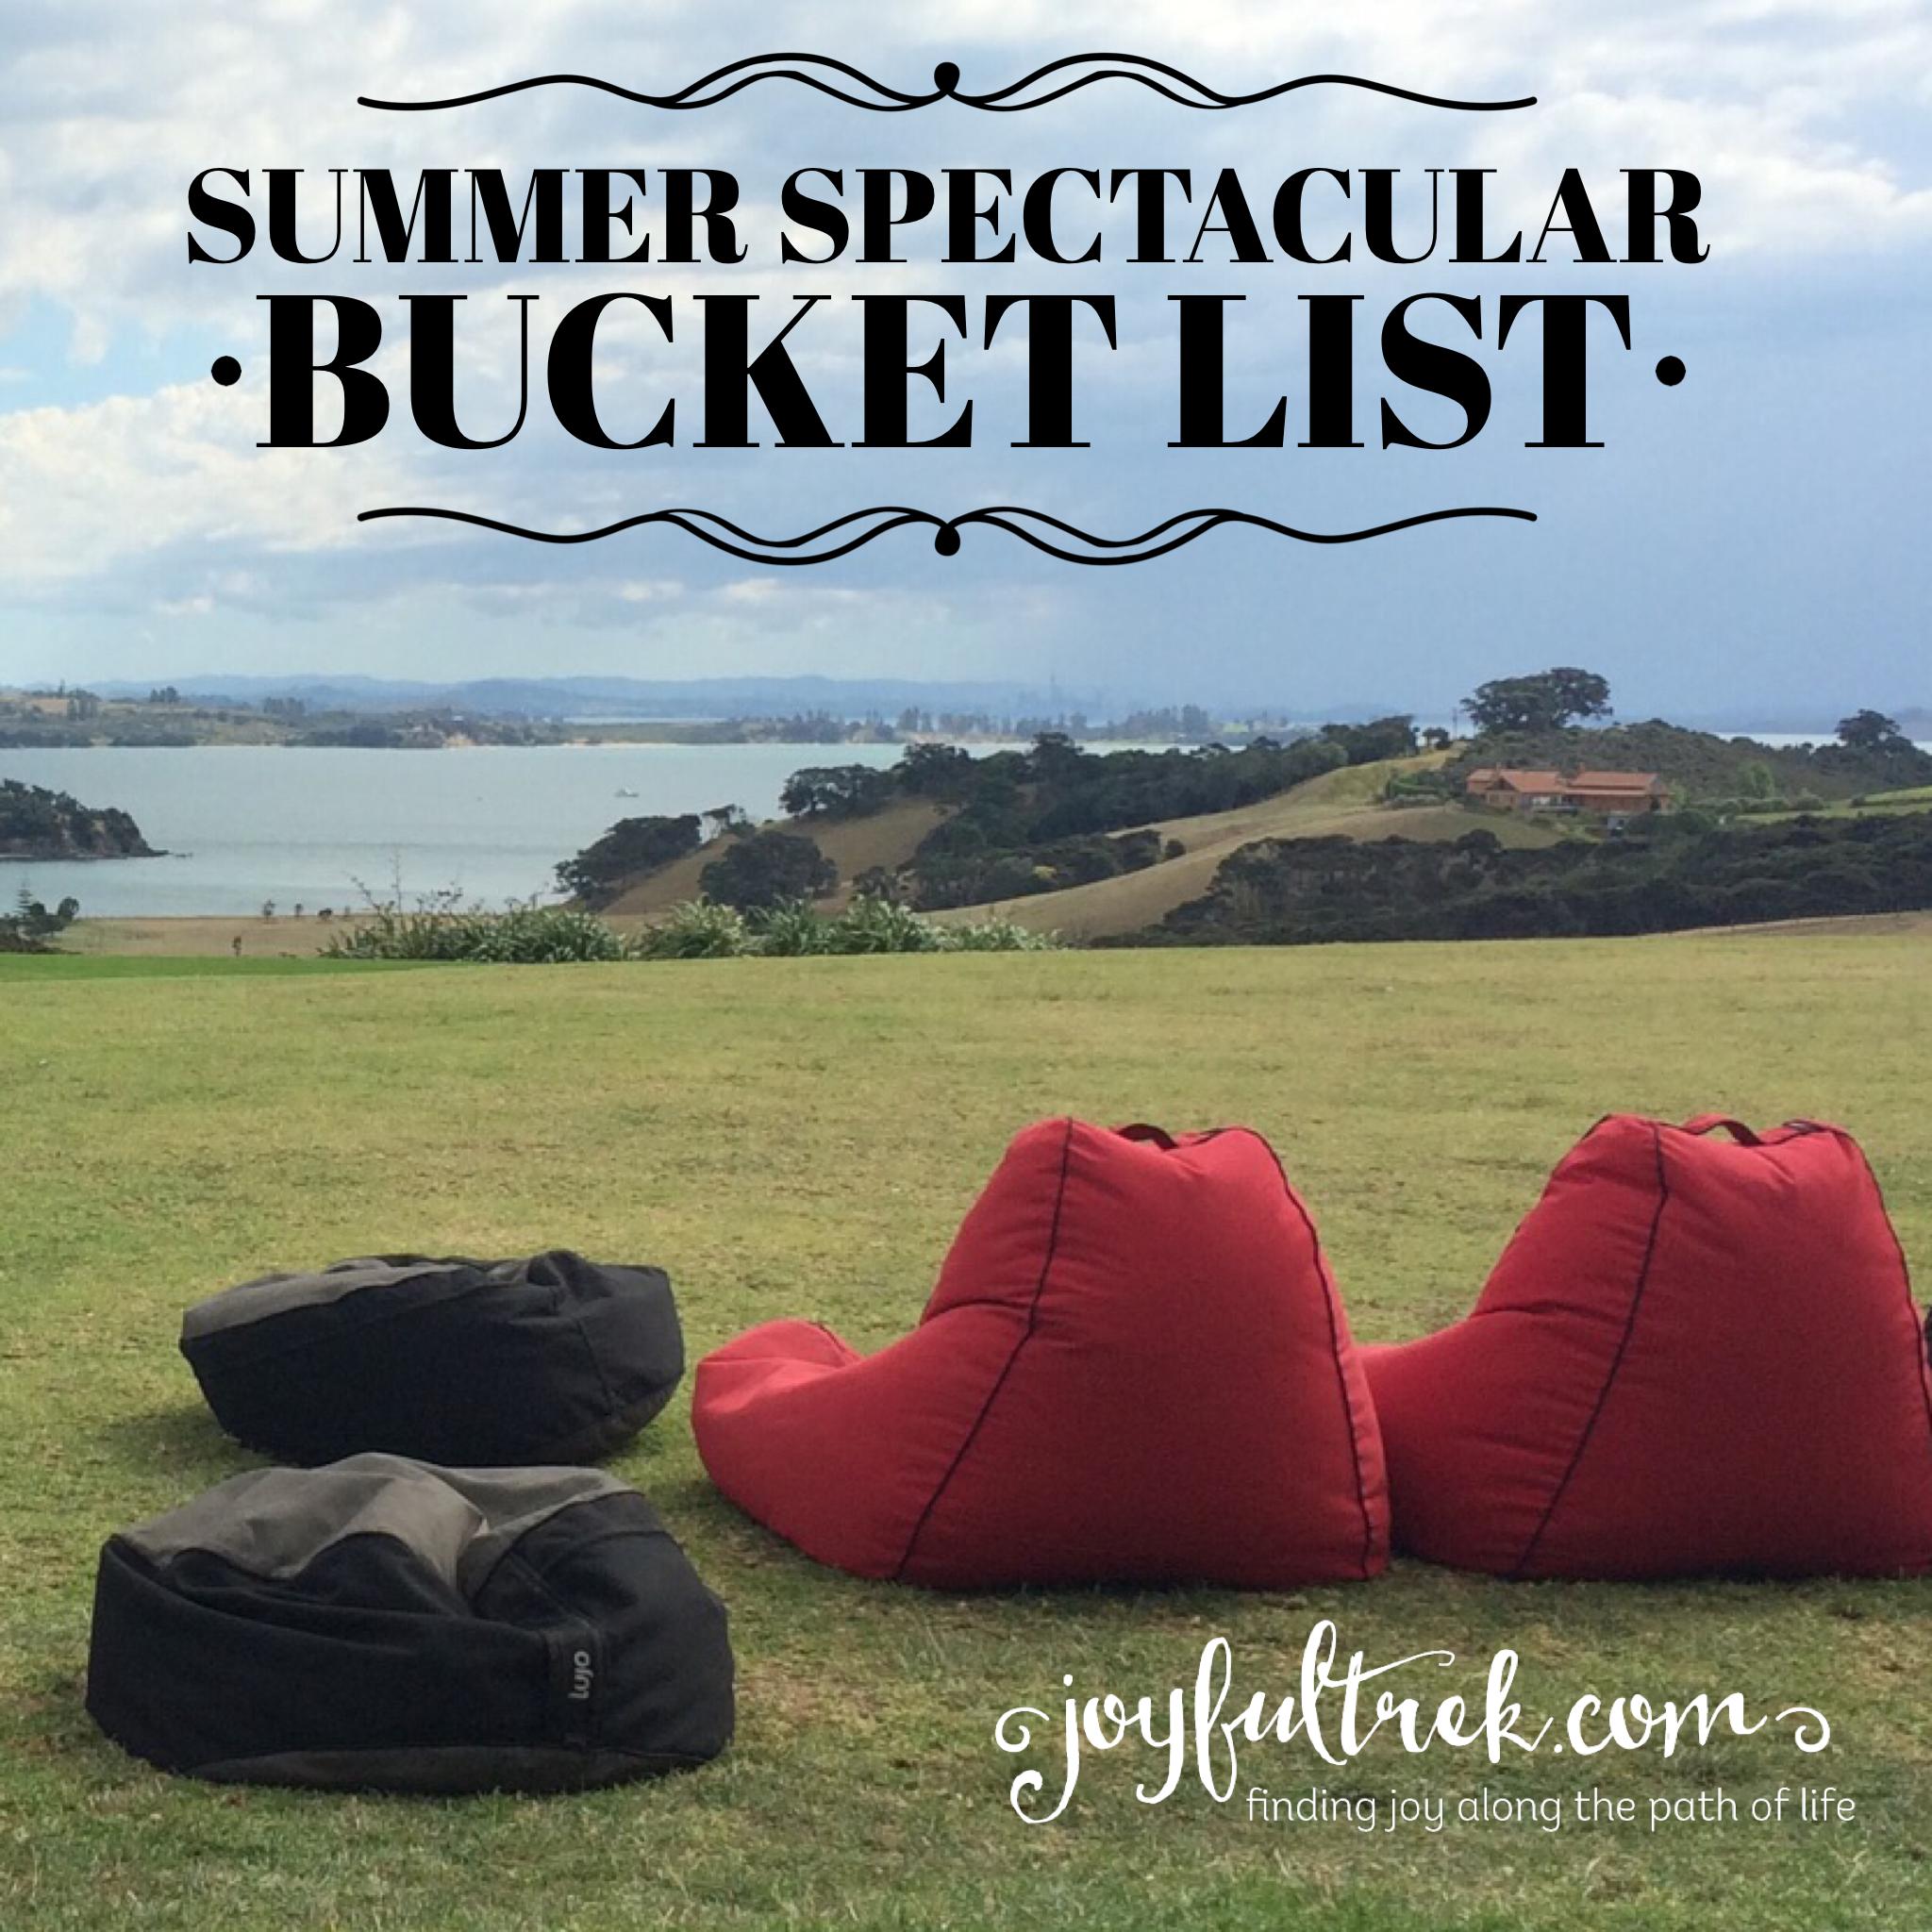 Summer Spectacular Bucket List